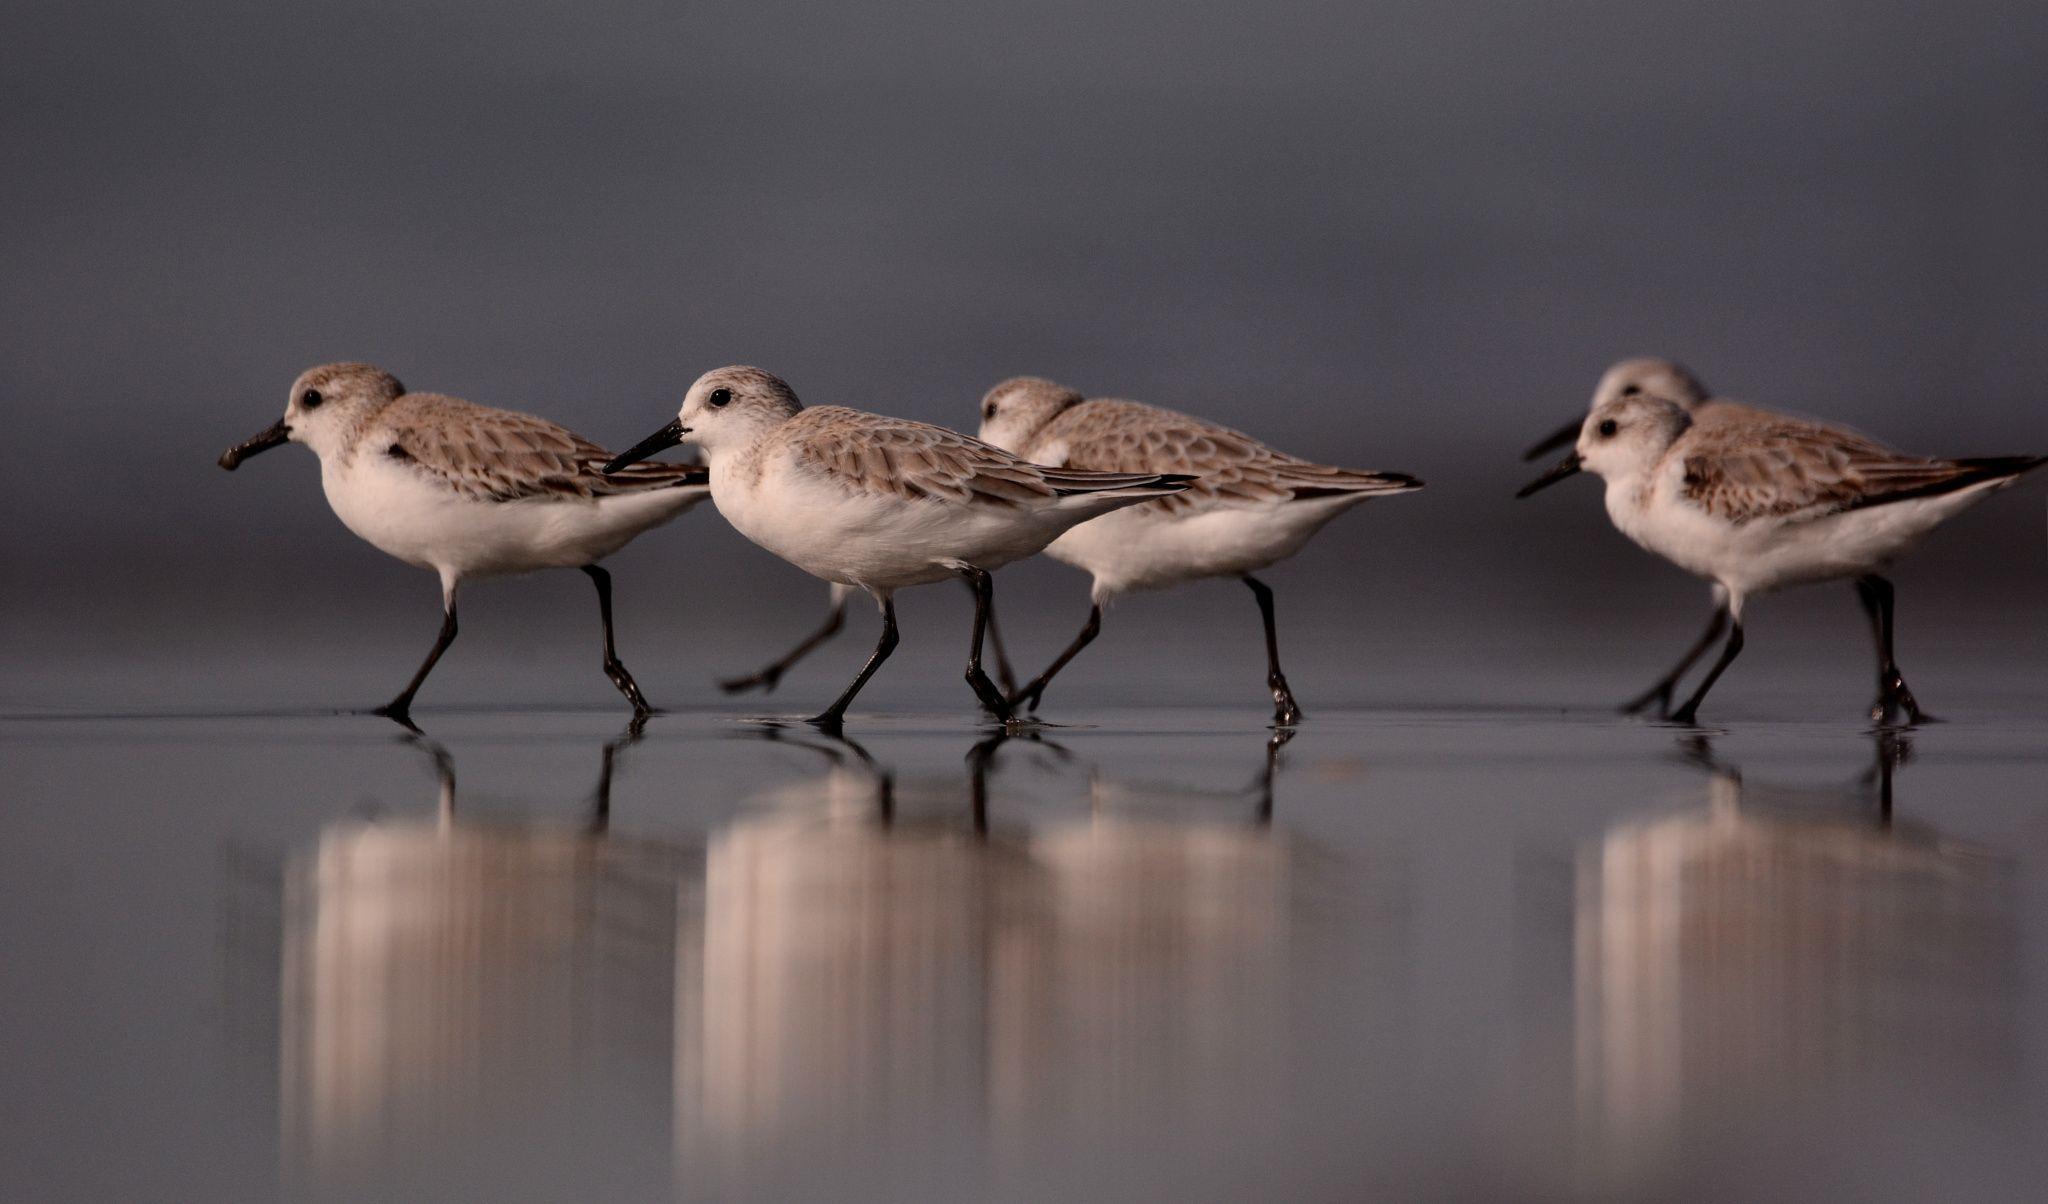 Sanderlings by Alex Appleby on 500px